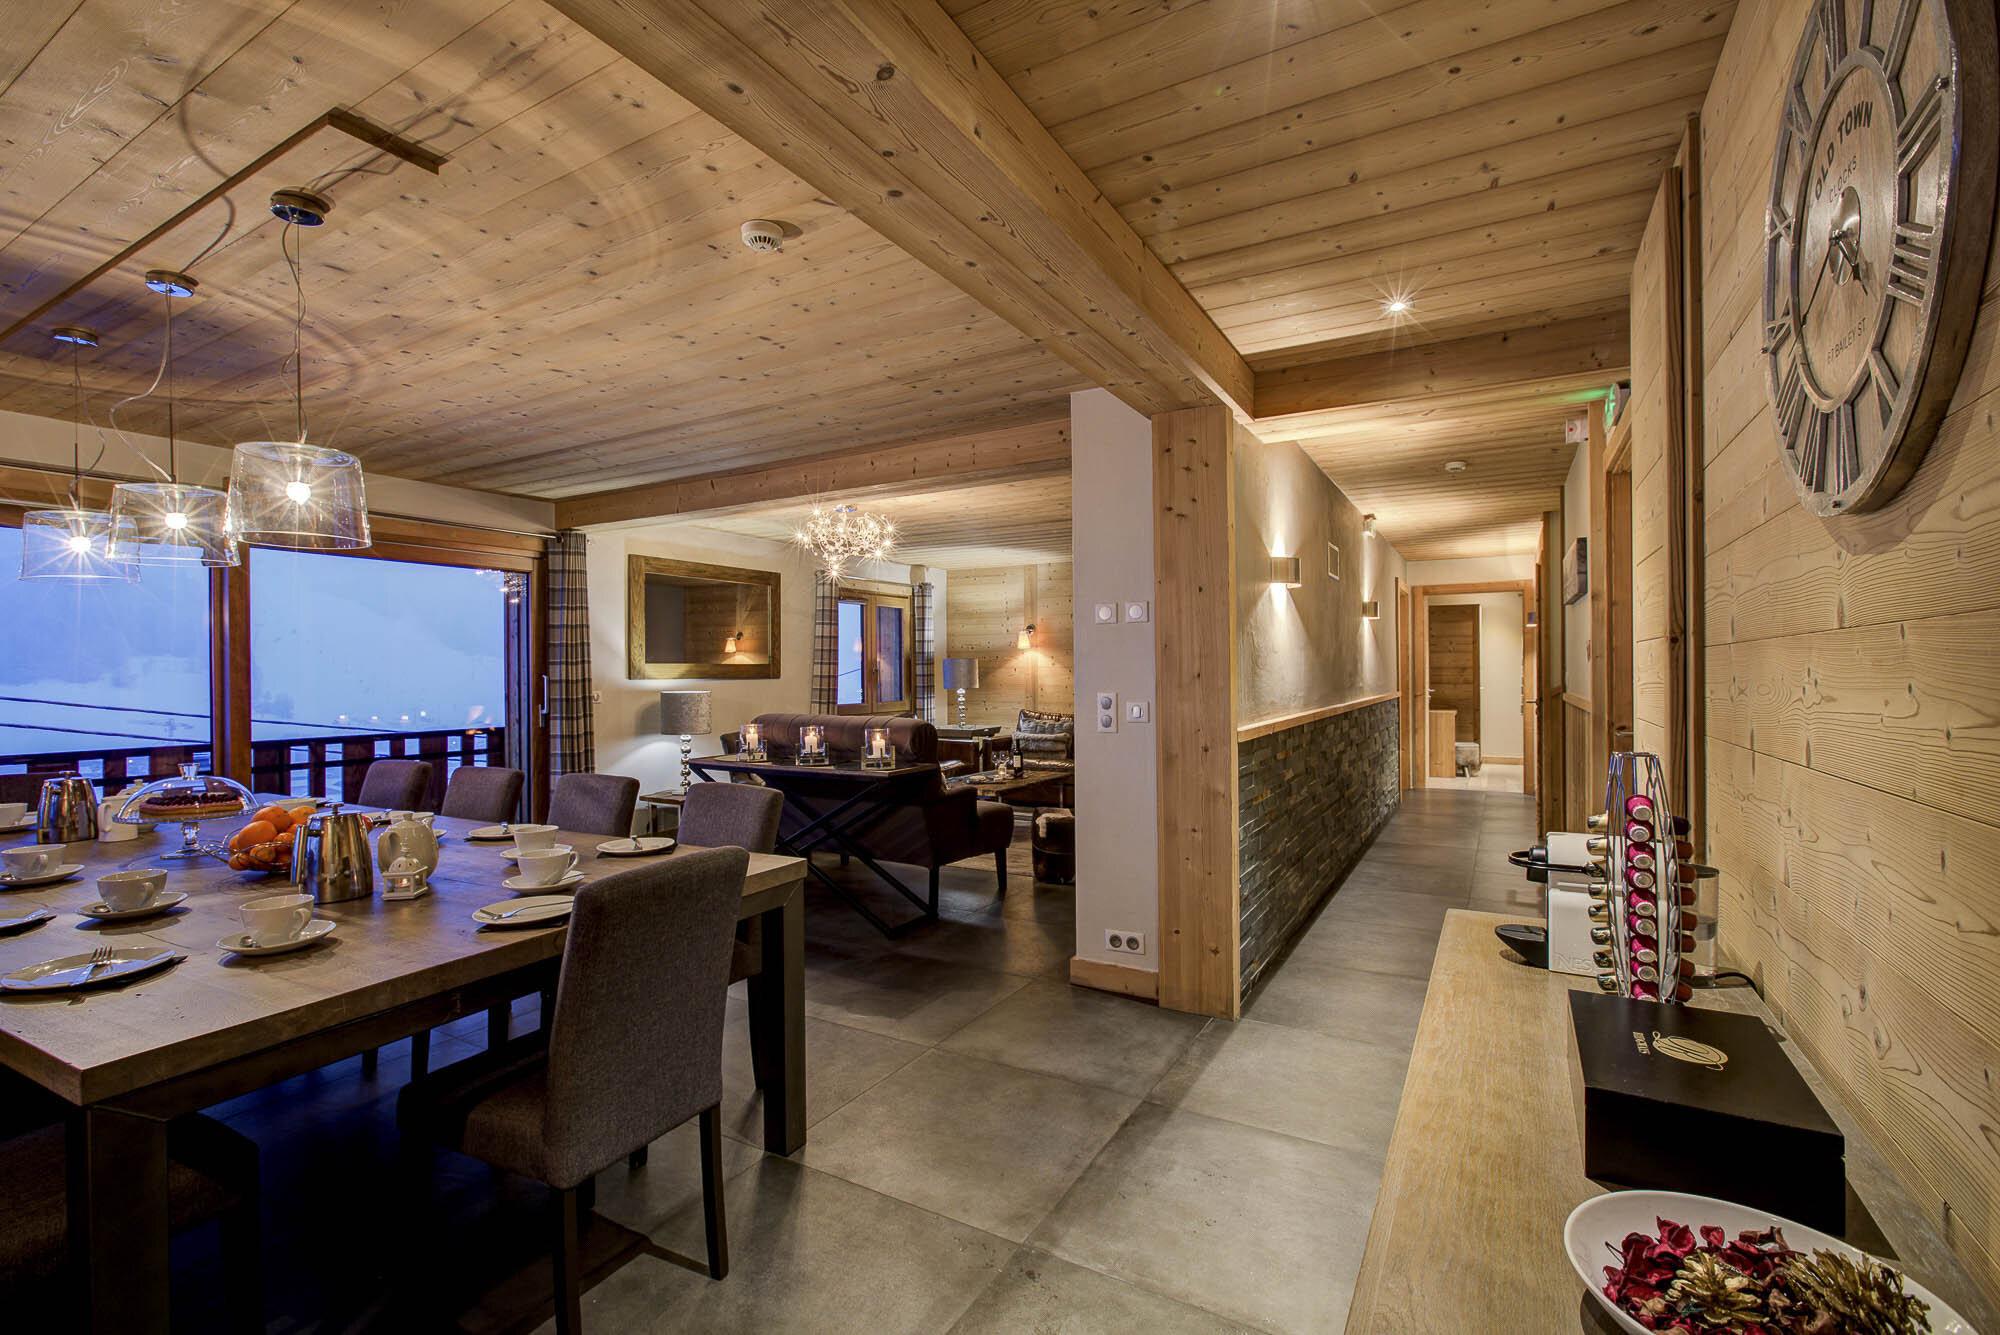 tg-ski-luxury-chalet-les-pierrys-morzine-004.jpg